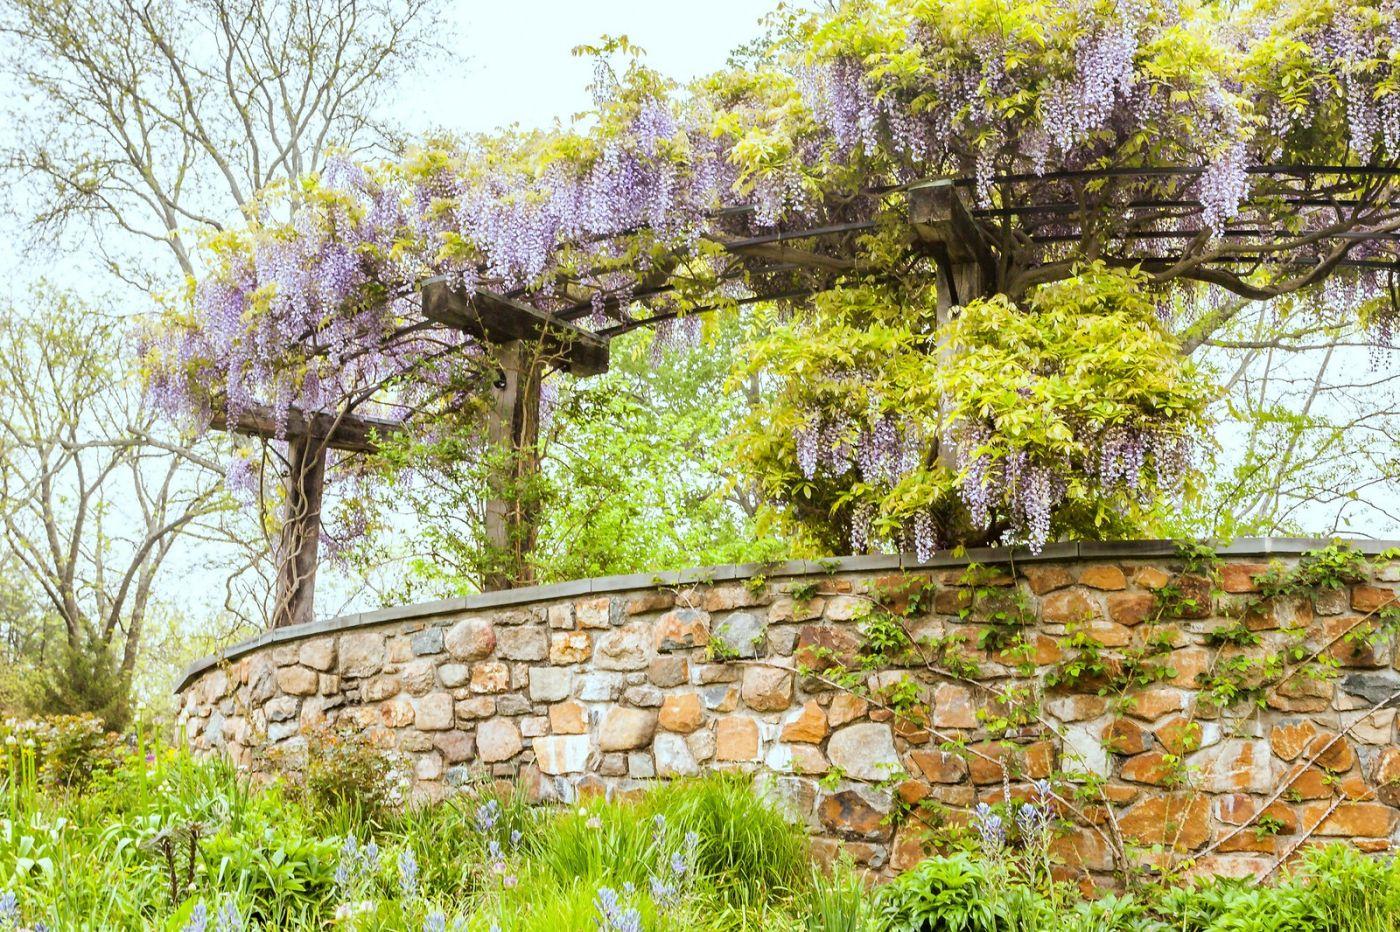 Chanticleer花园,那年盛开的紫藤花_图1-21